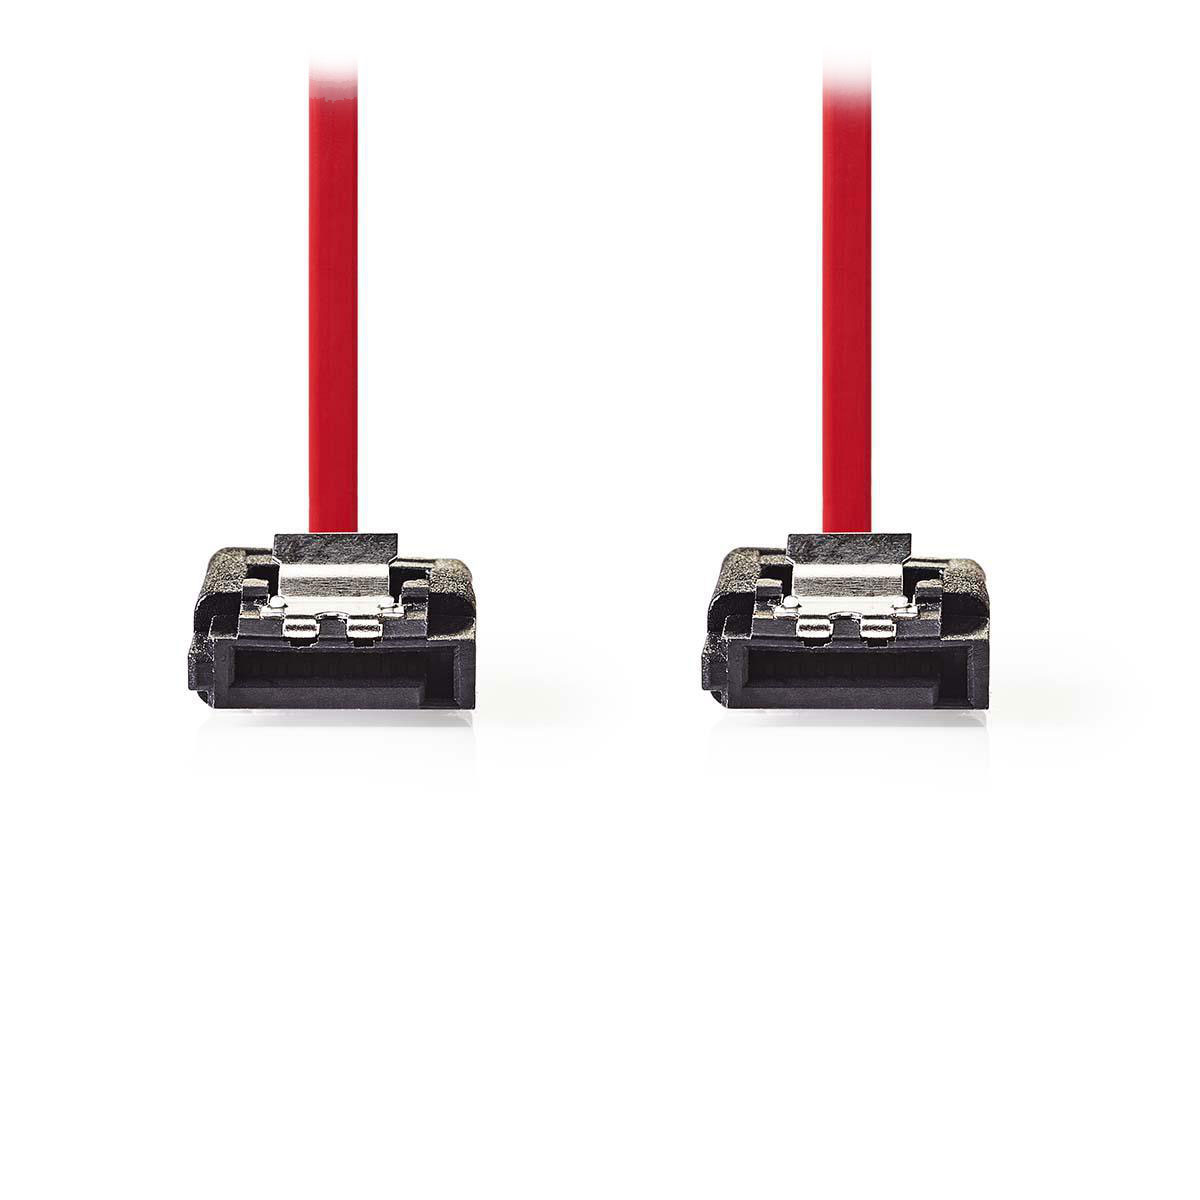 Serial ATA NEDIS Câble SATA avec verrou (50 cm) Câble compatible SATA II (3 Gb/s)